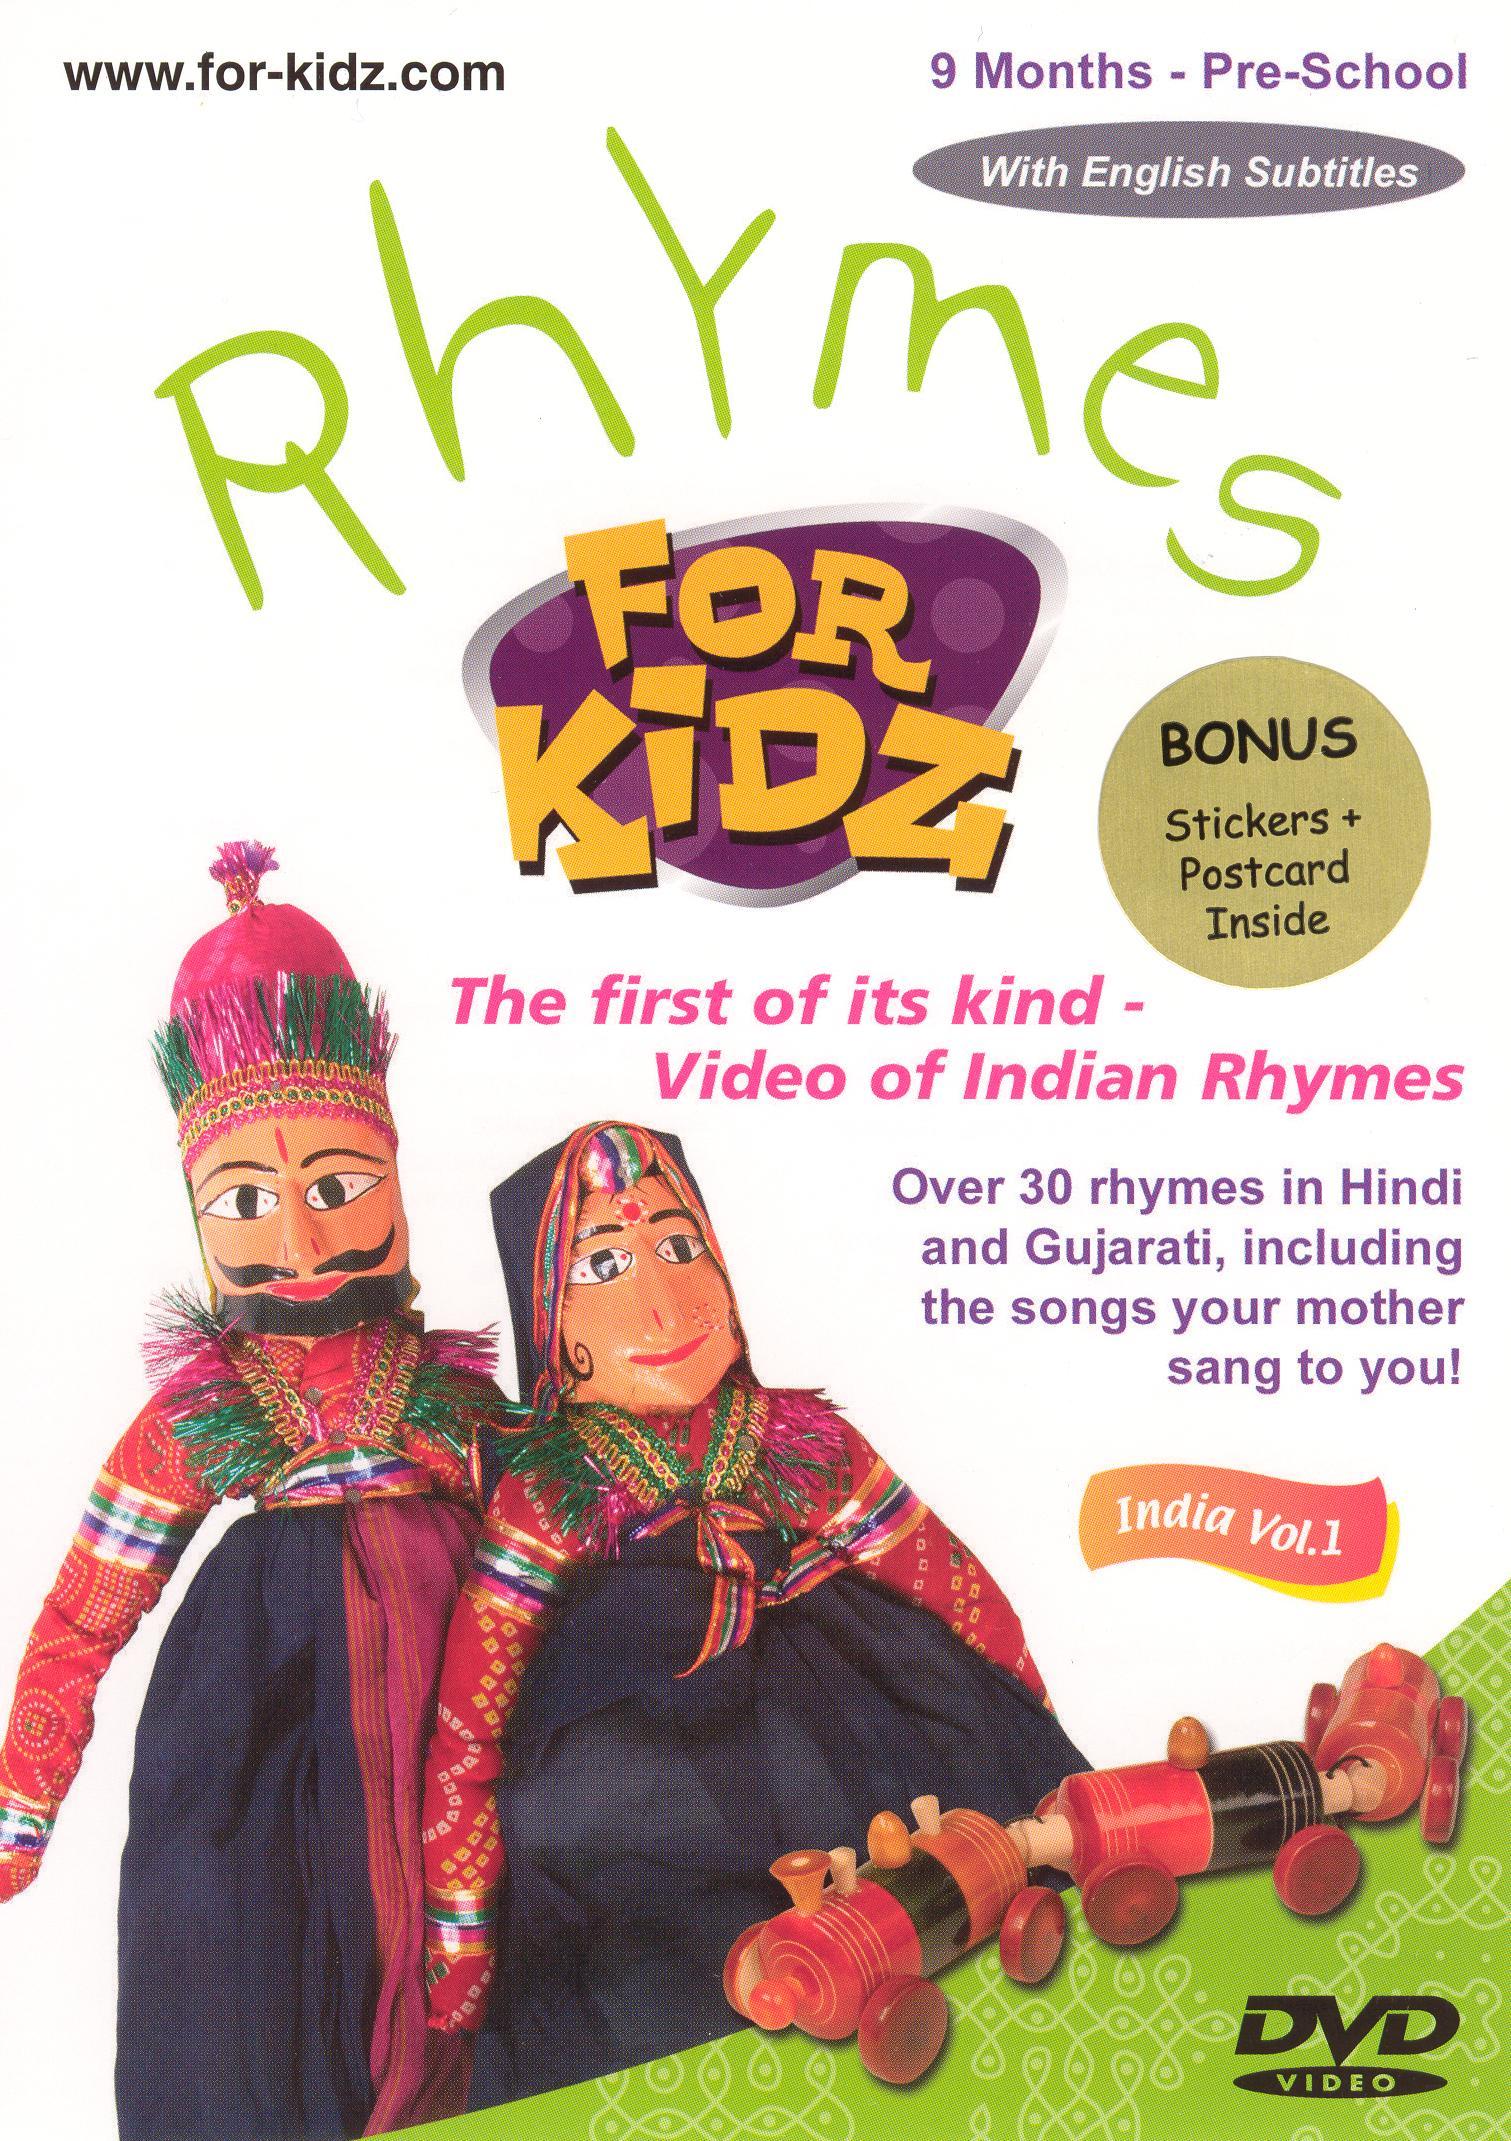 Rhymes For Kidz, Vol. 1: India